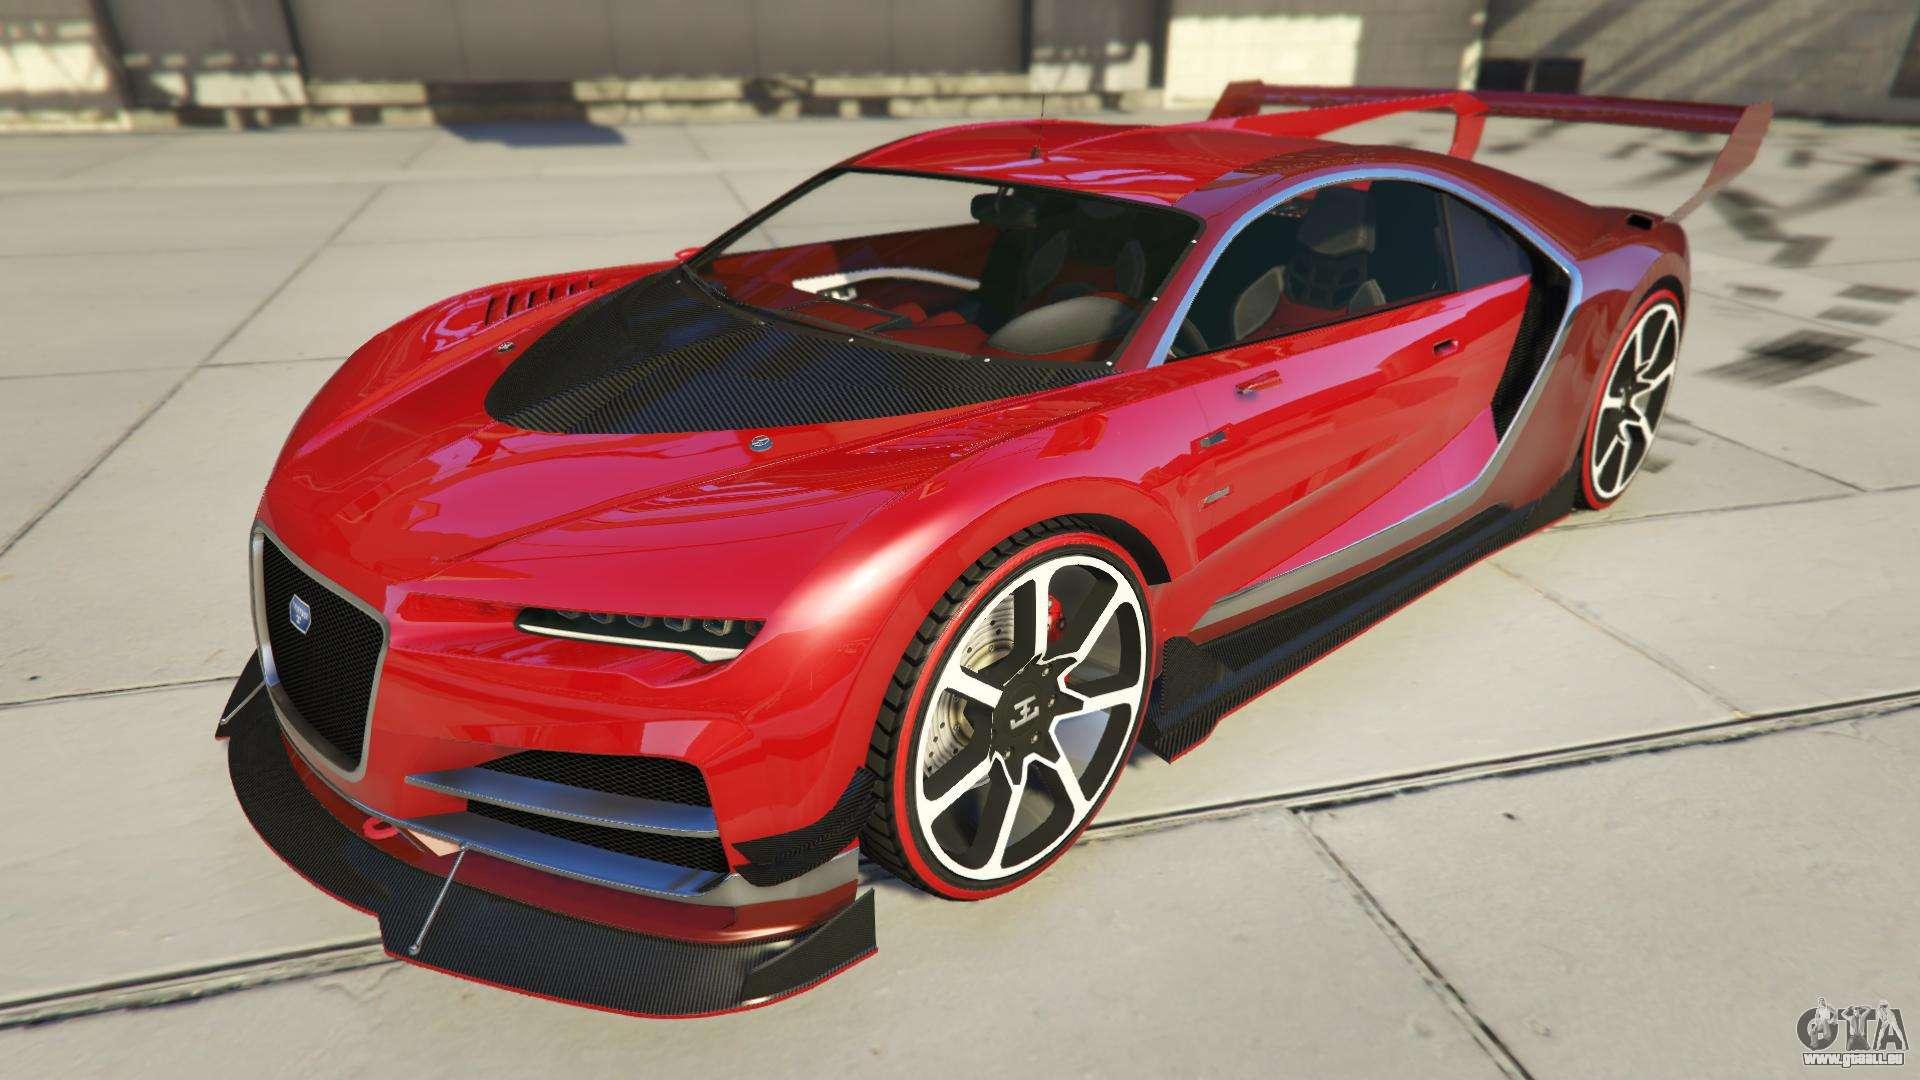 Truffade Nero Custom de GTA Online